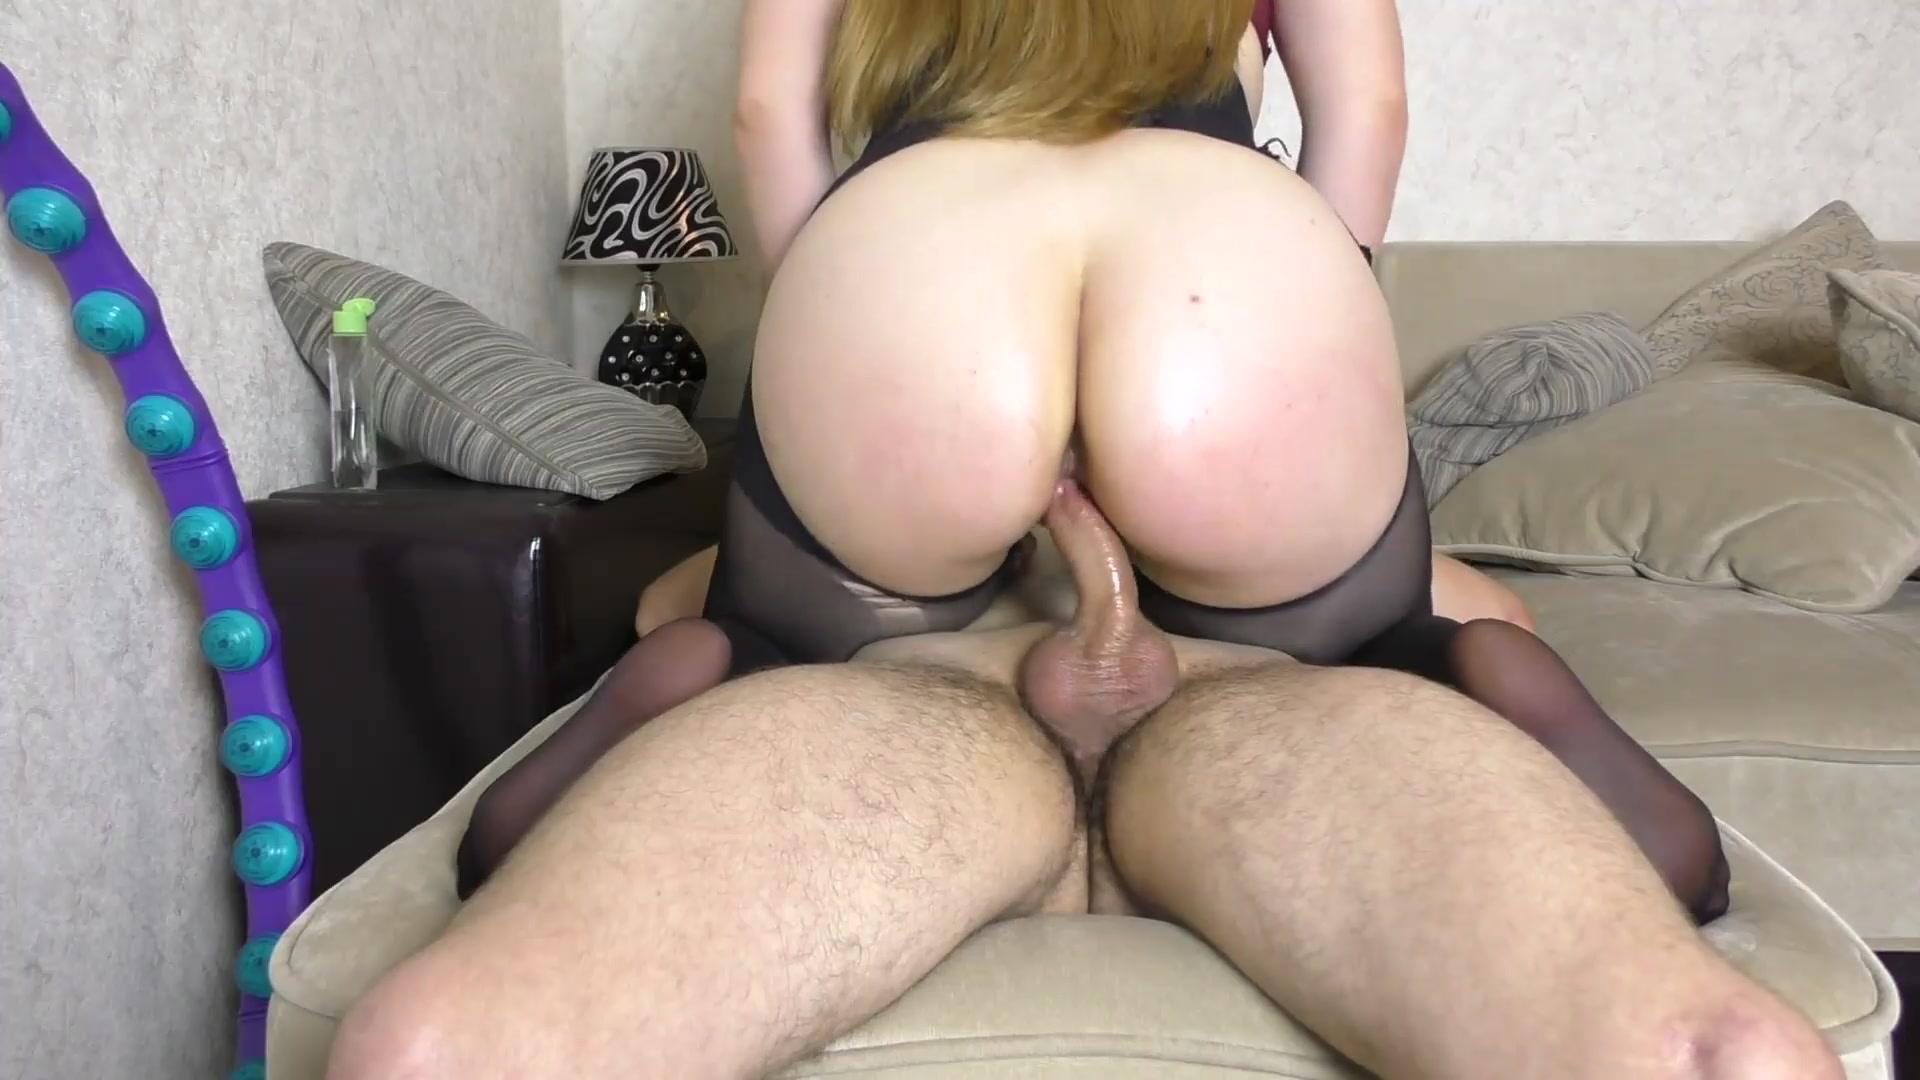 big ass riding dildo slow